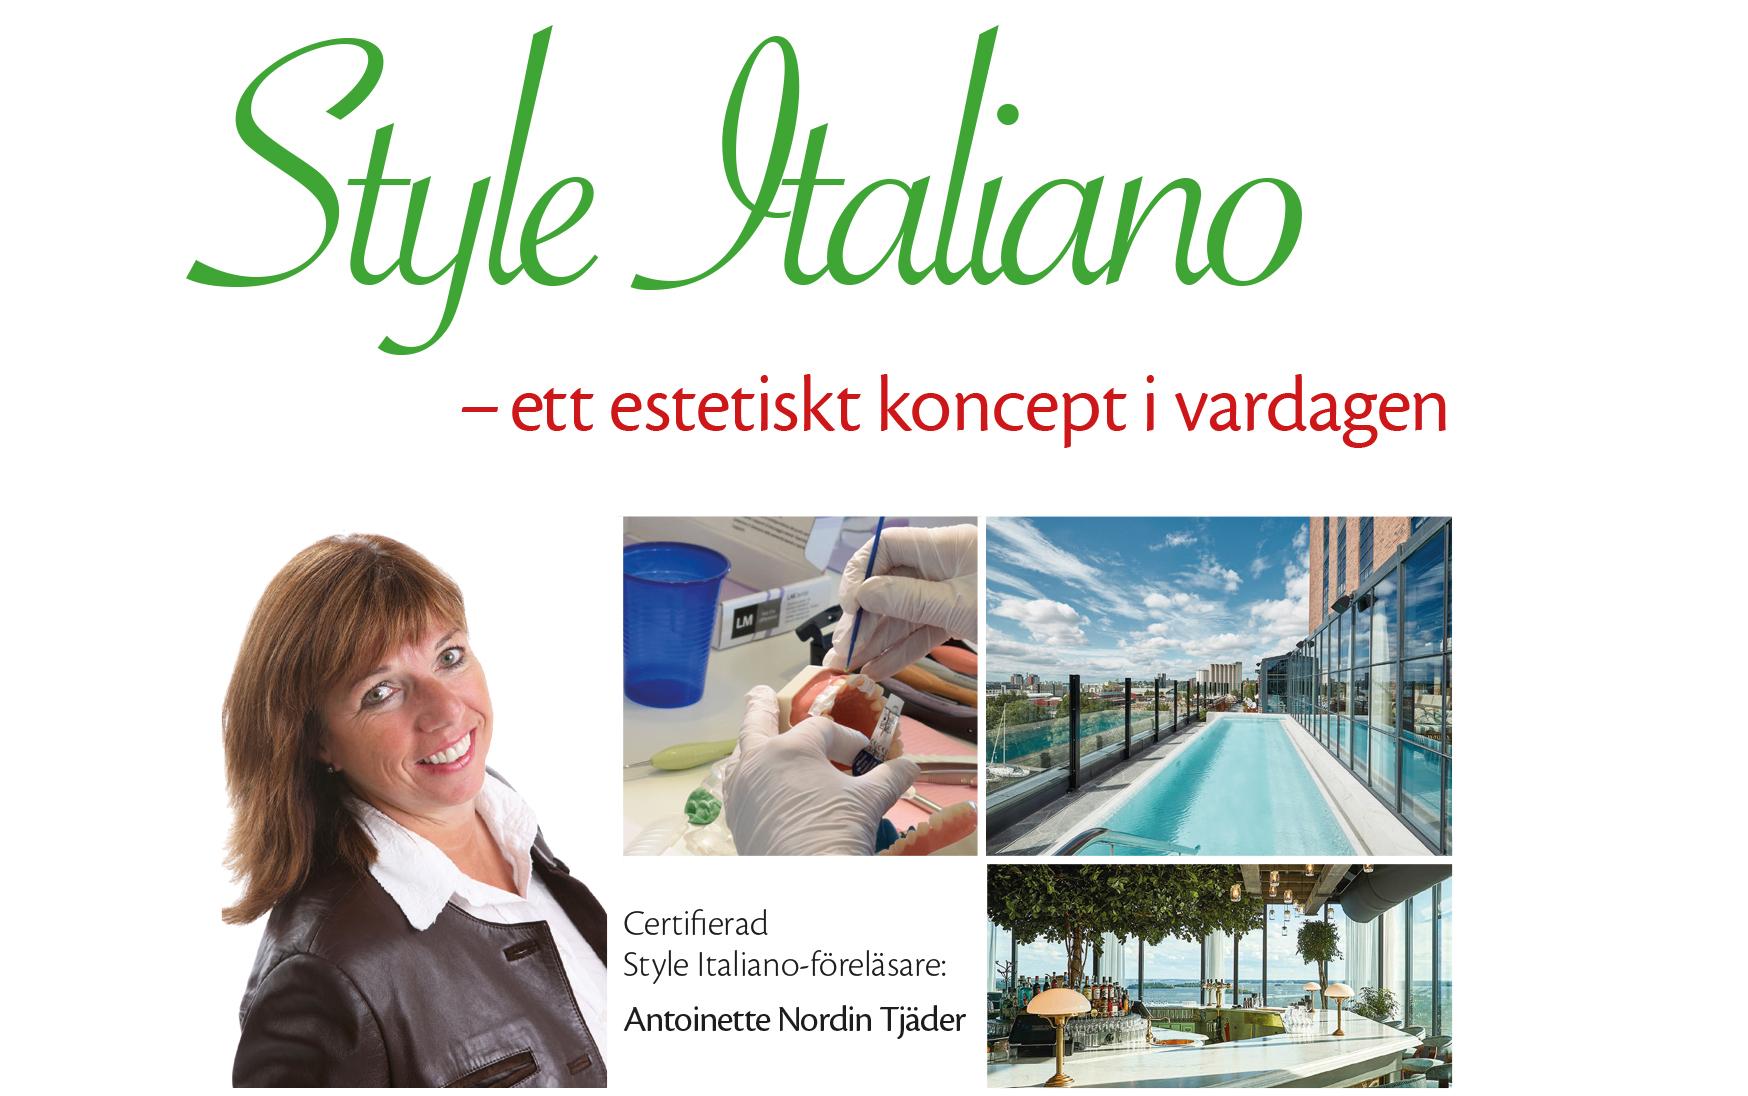 Inbj_StyleItaliano_Västerås_Sept2019_web.jpg